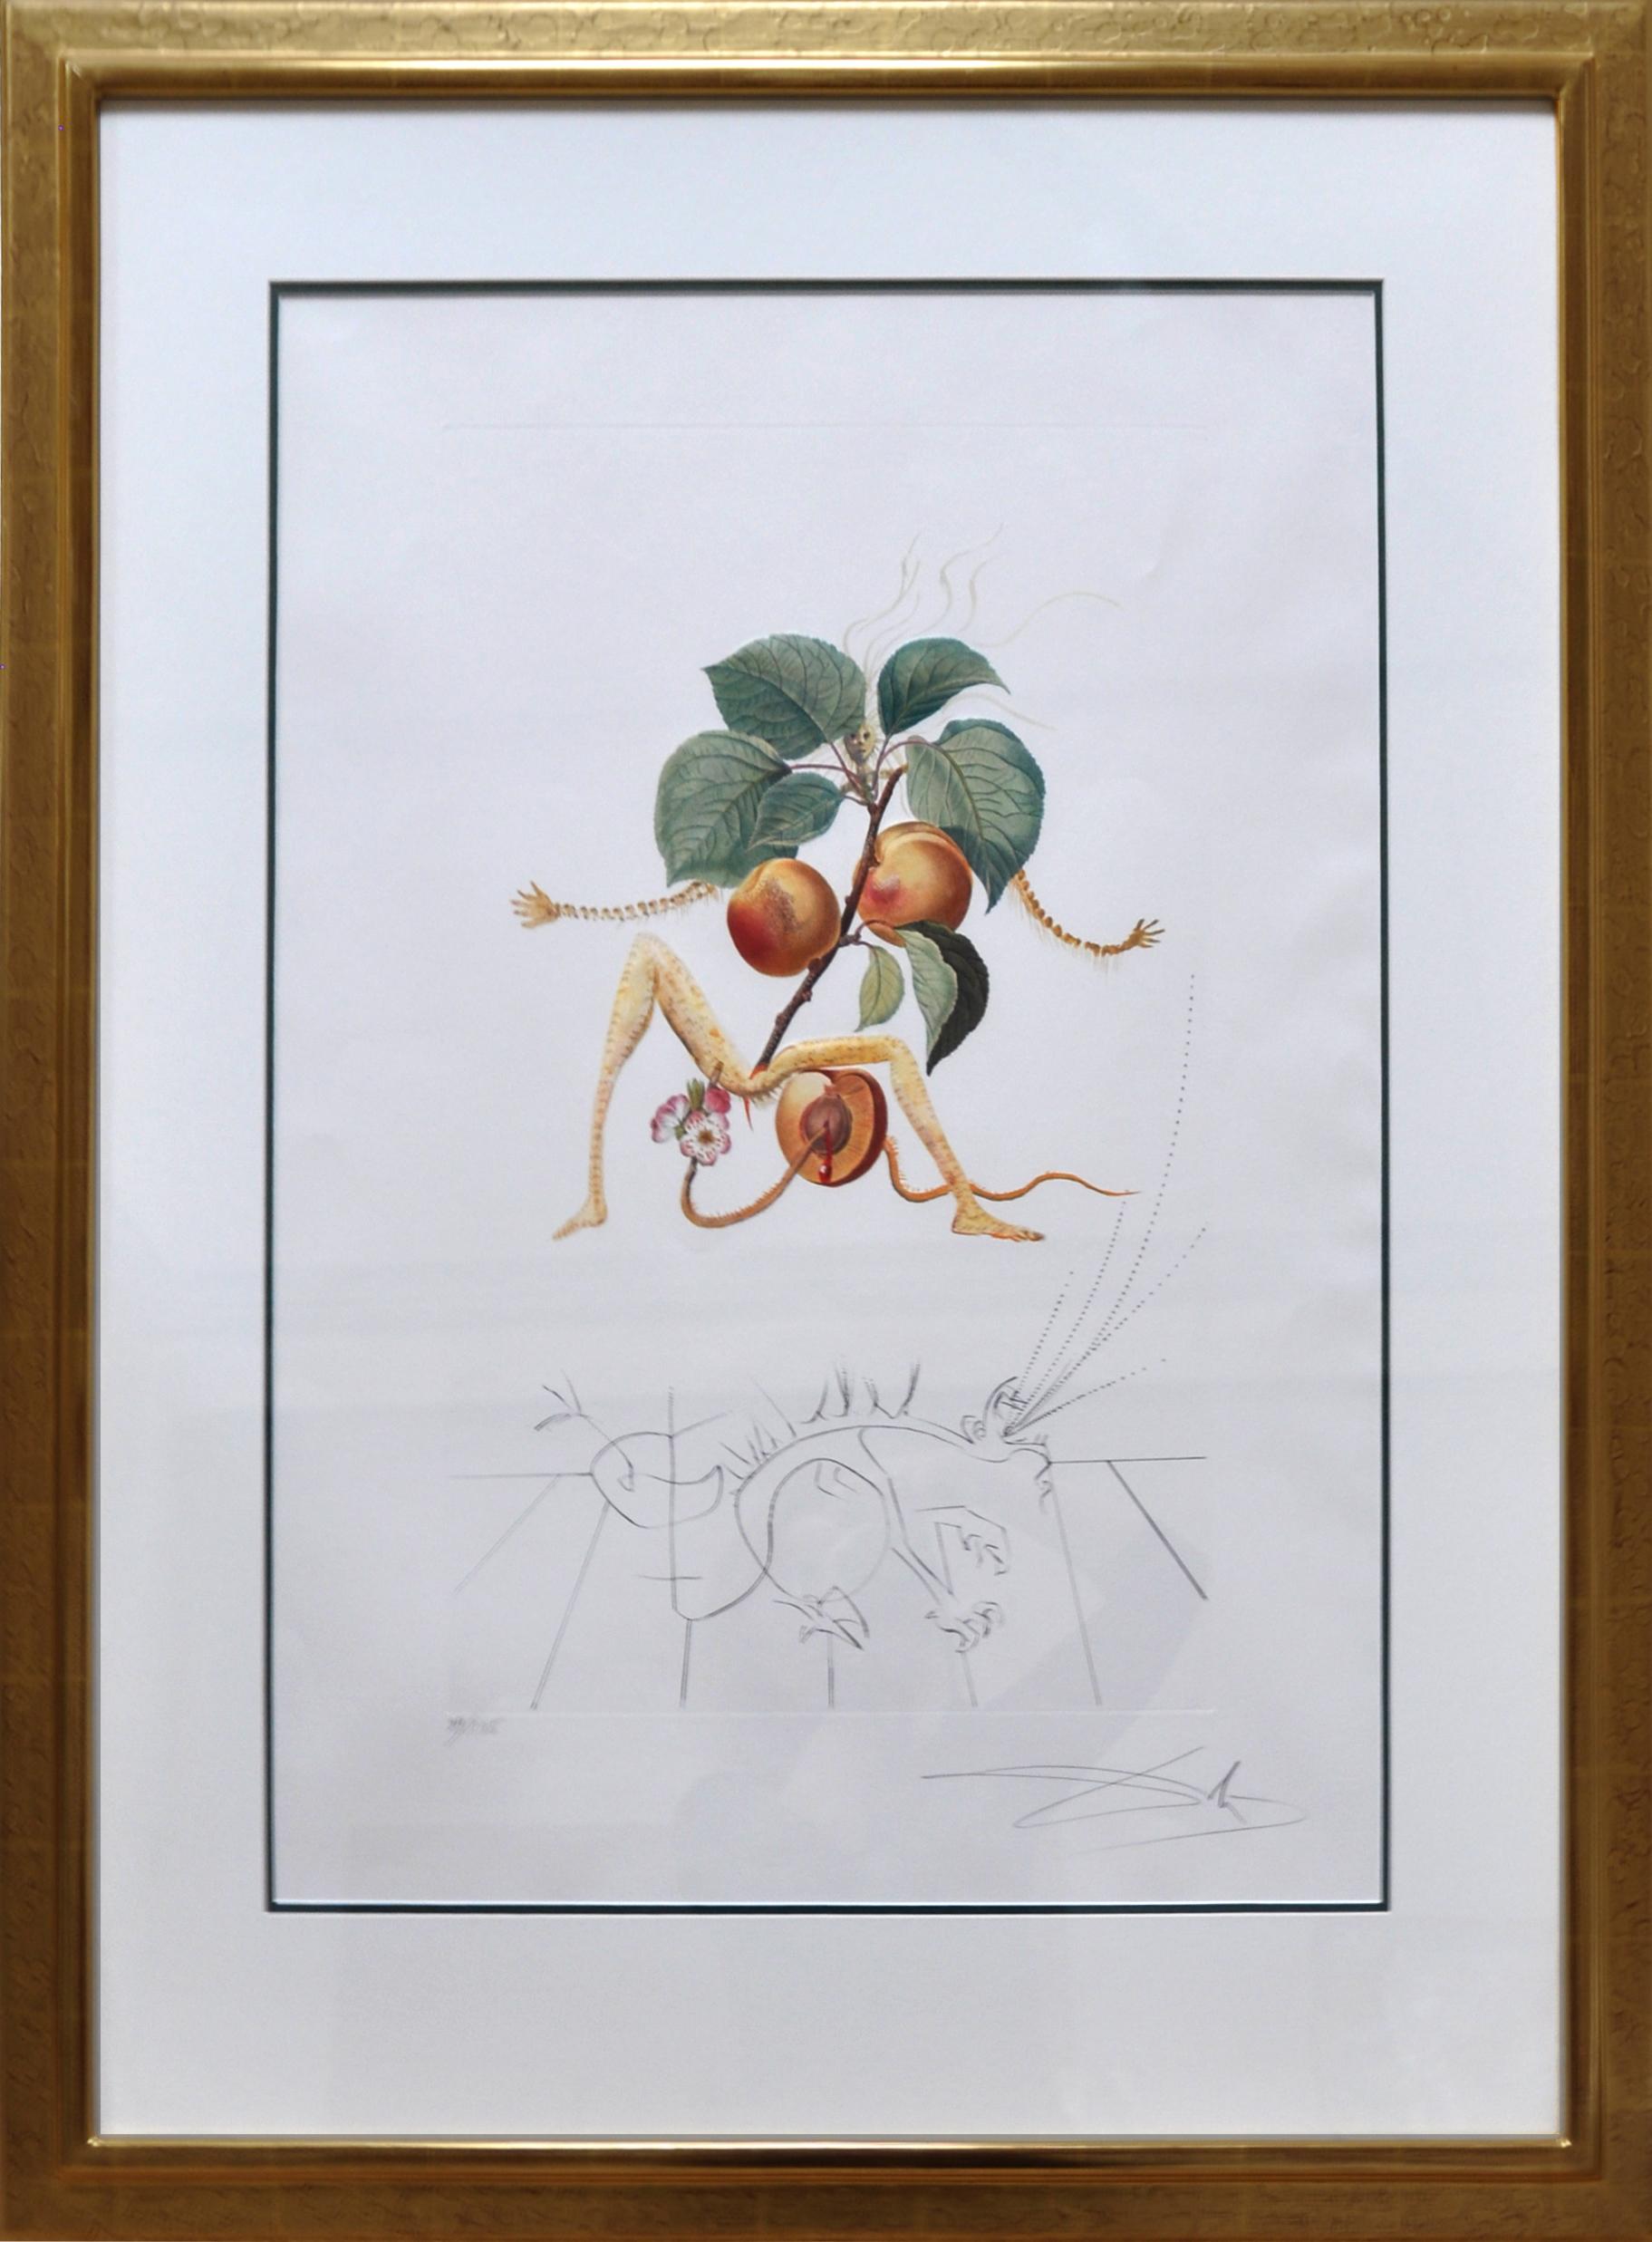 Salvador Dalí - Abricot , 0611-008-542